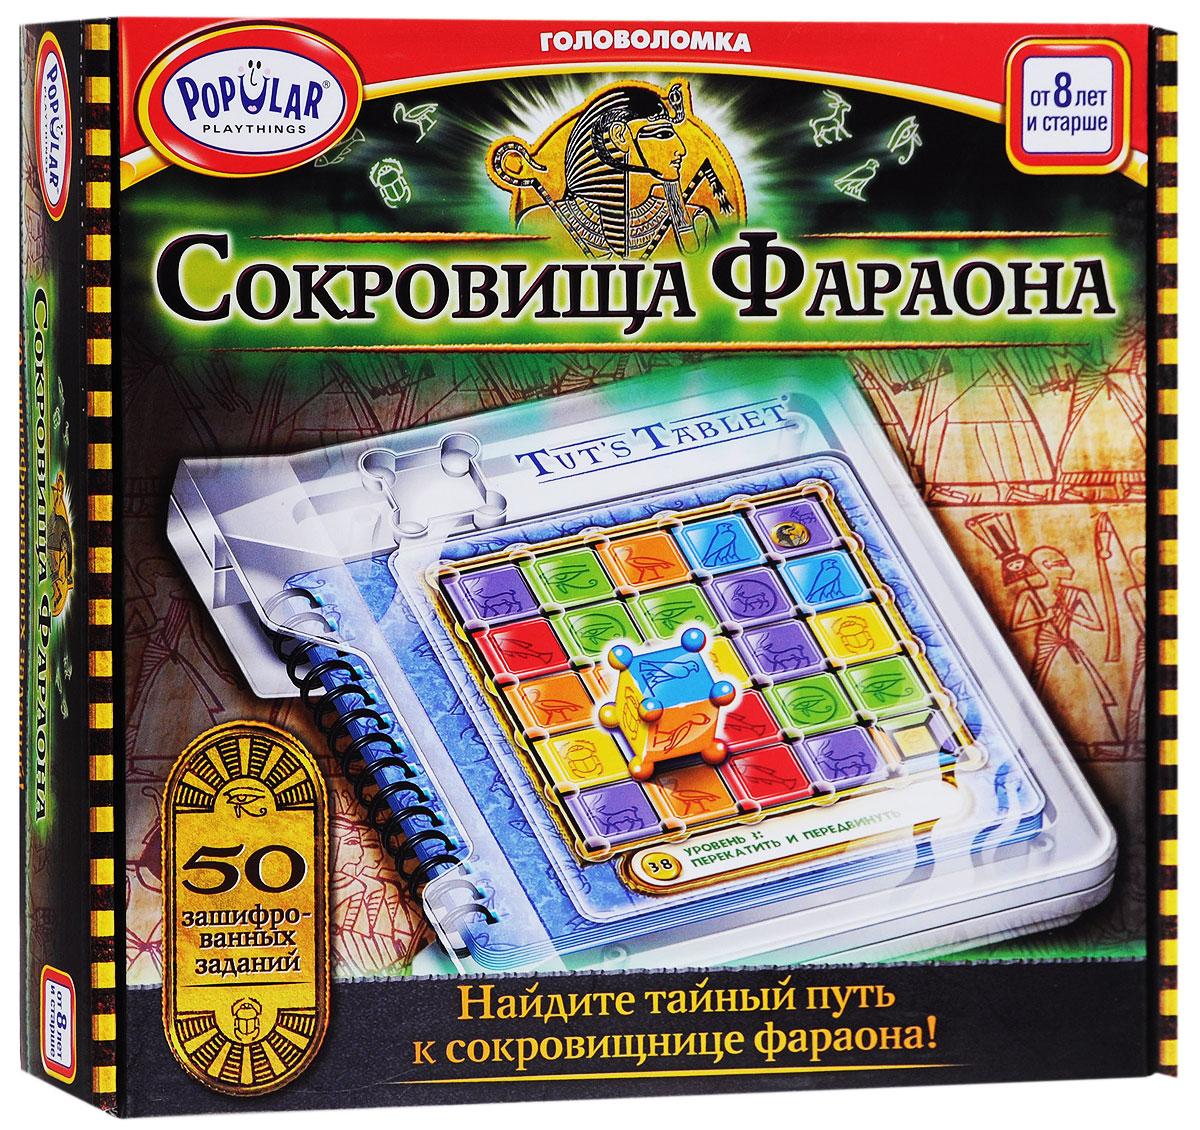 Popular Playthings Настольная игра Сокровища Фараона -